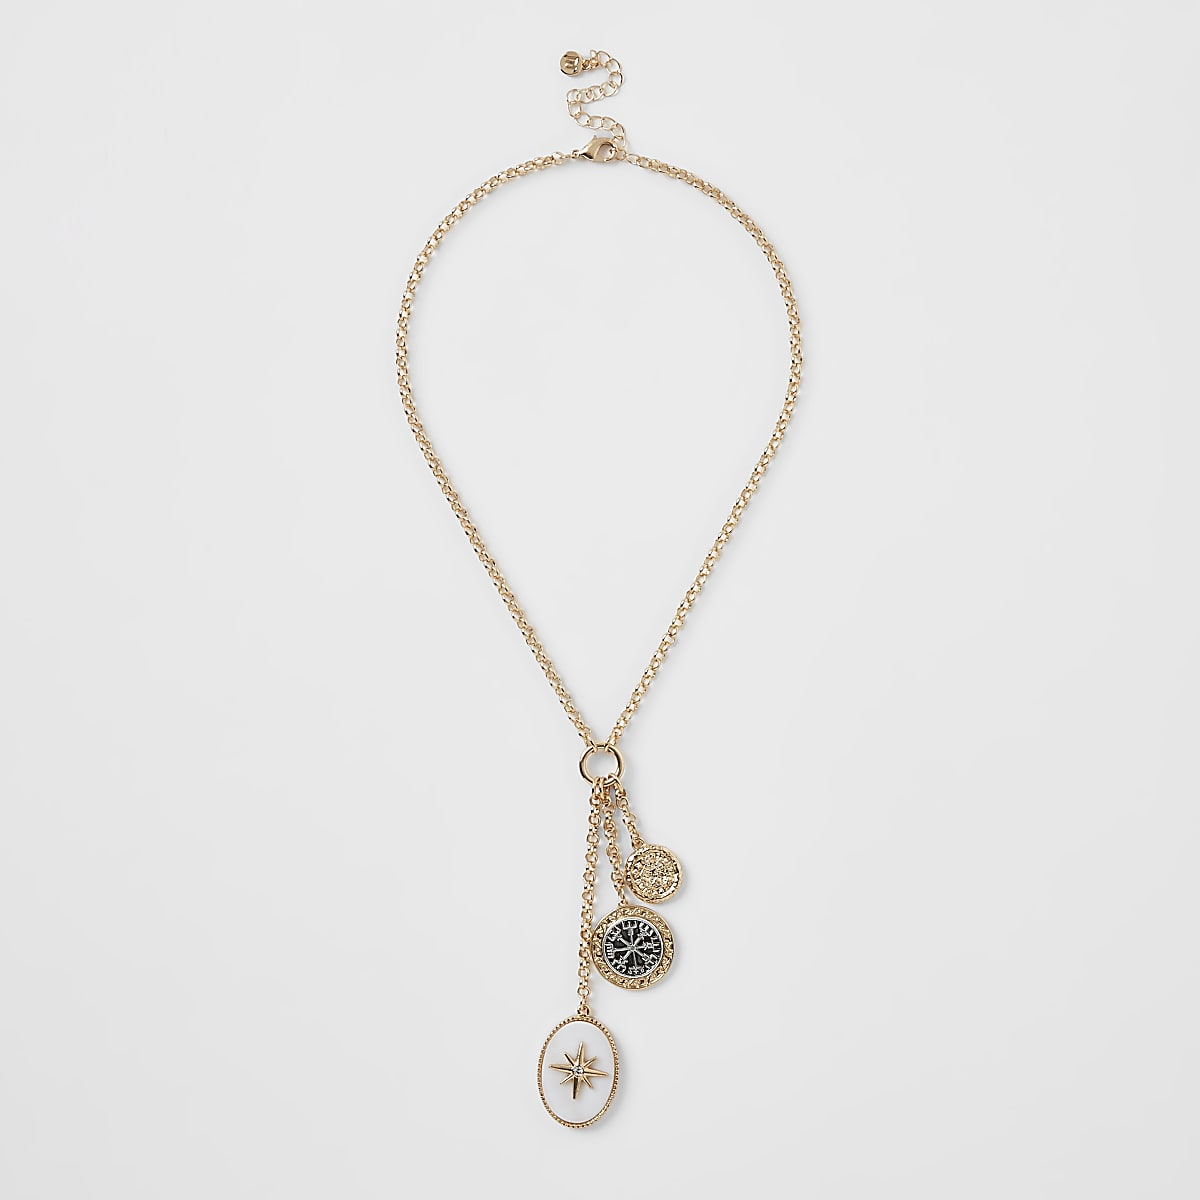 Gold colour oval pendant necklace